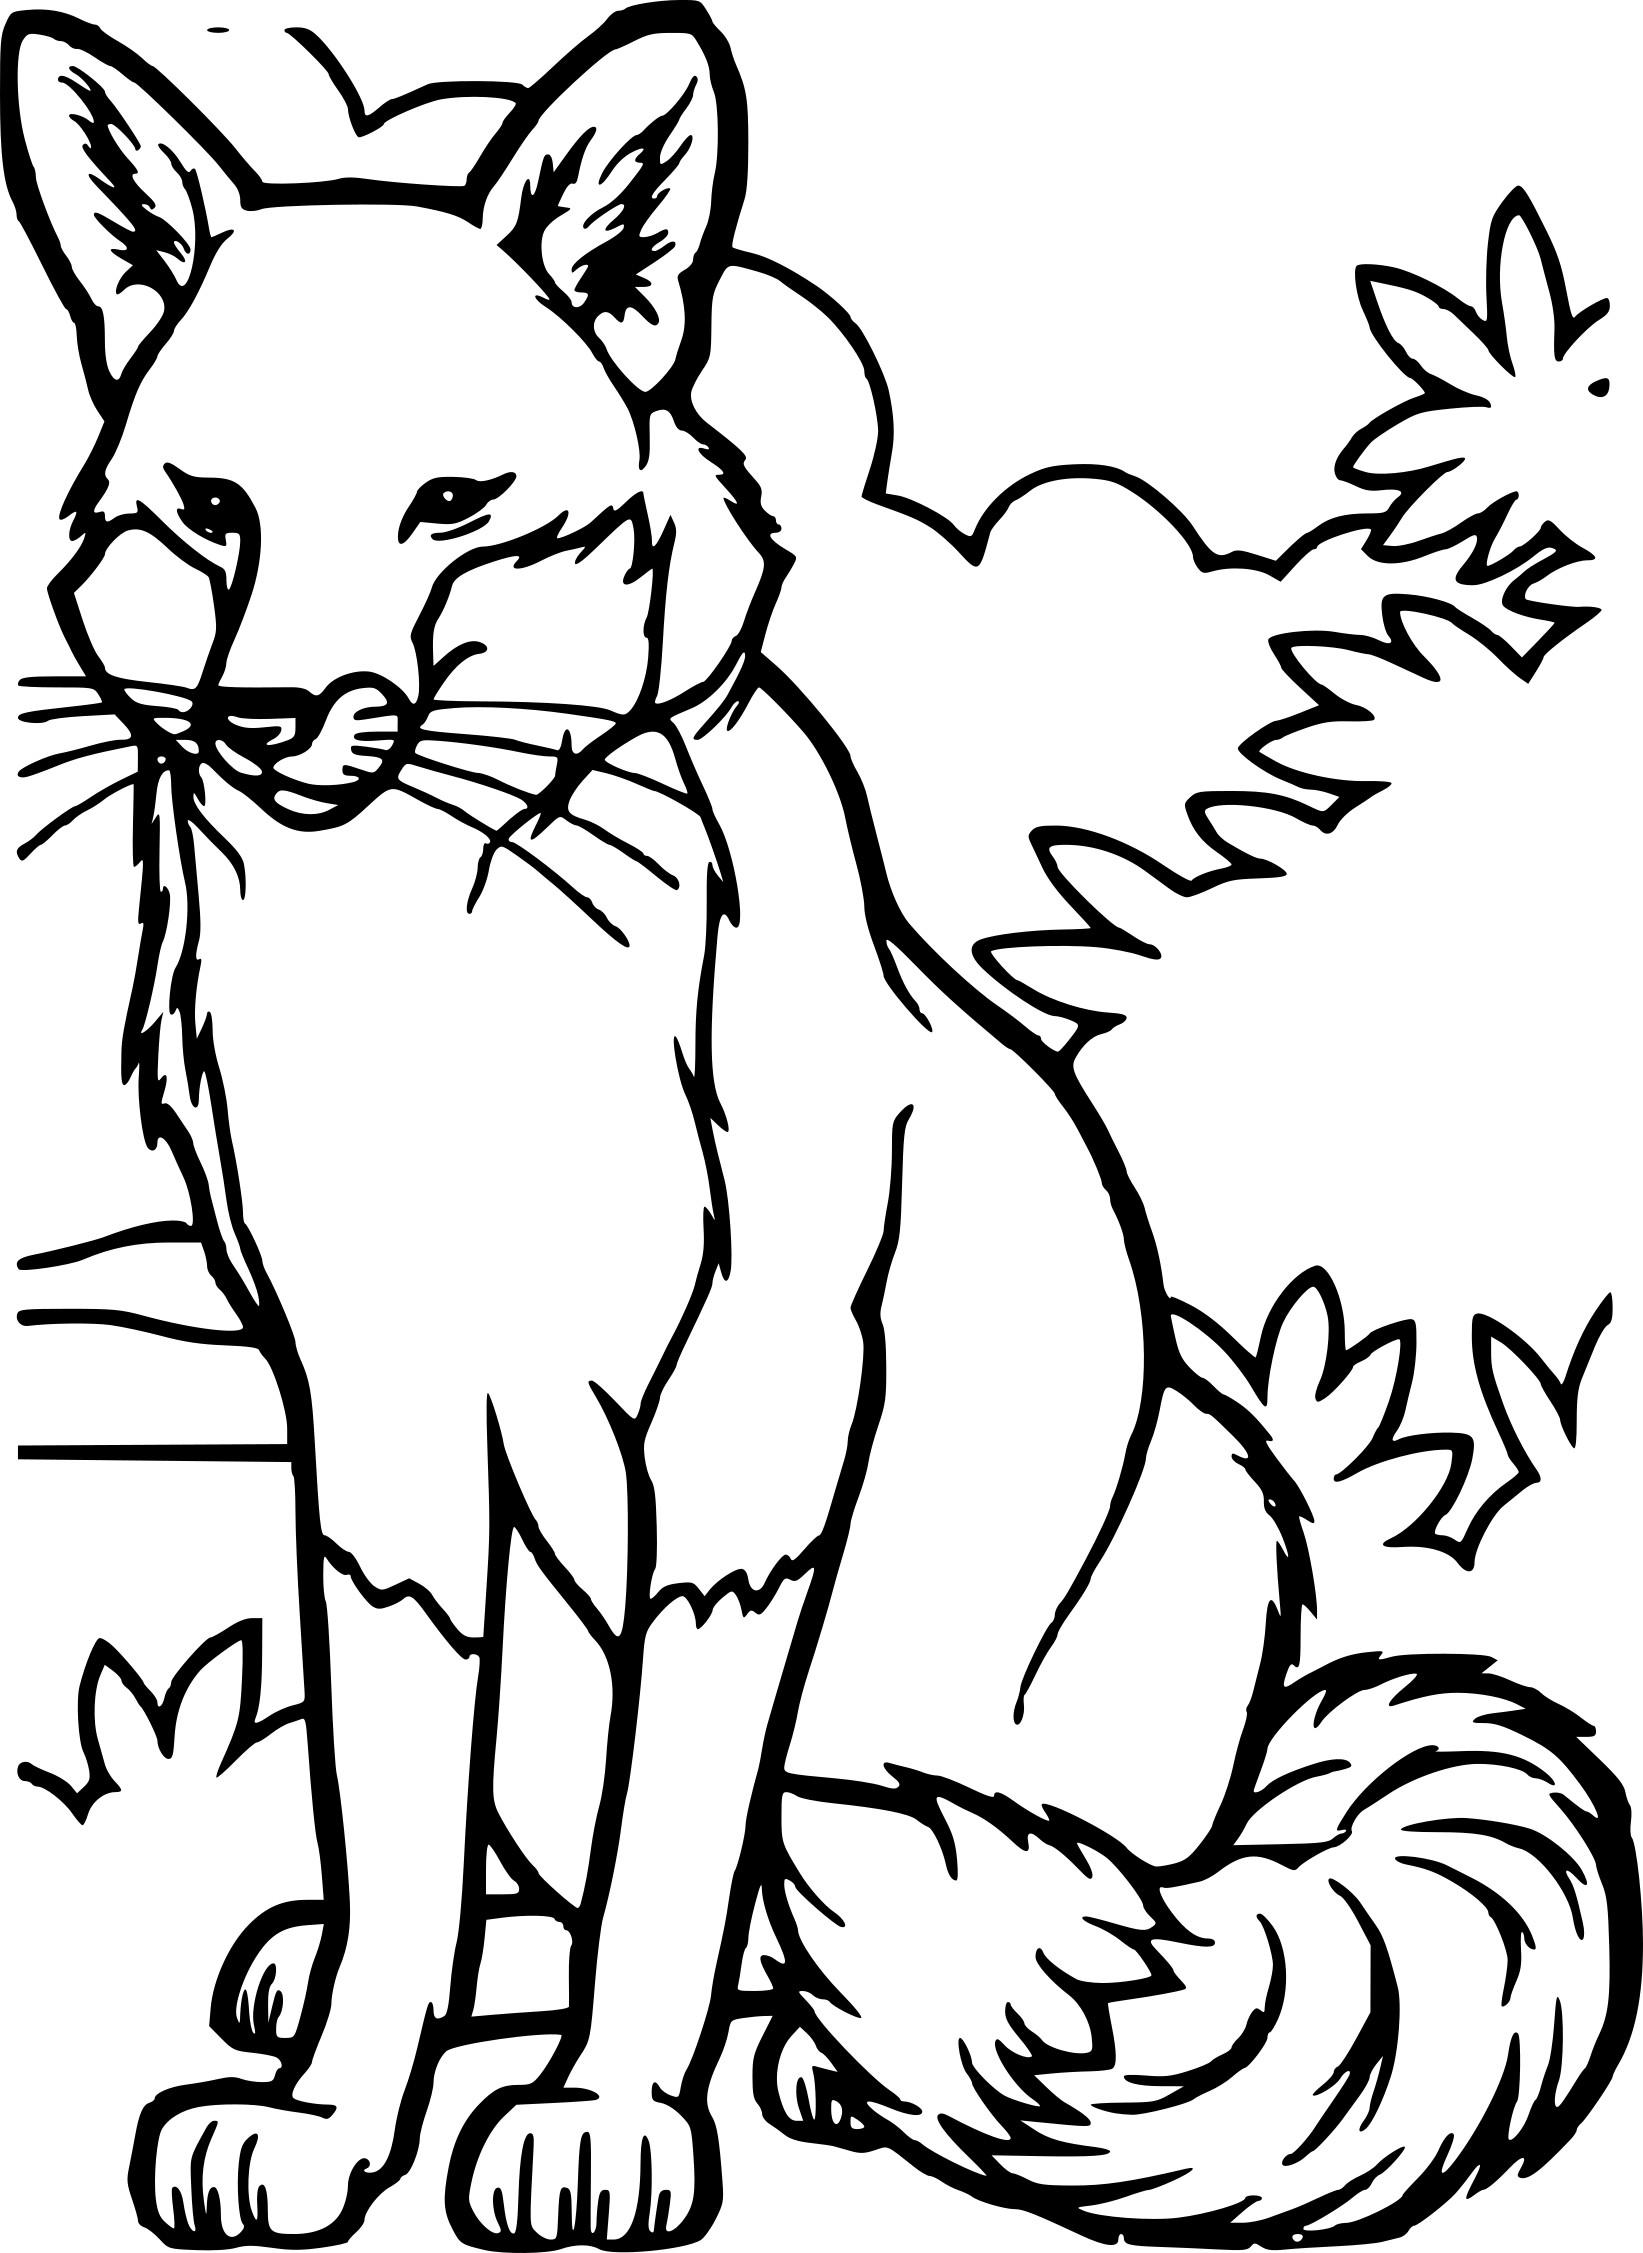 Coloriage renard et dessin imprimer - Coloriage renard ...